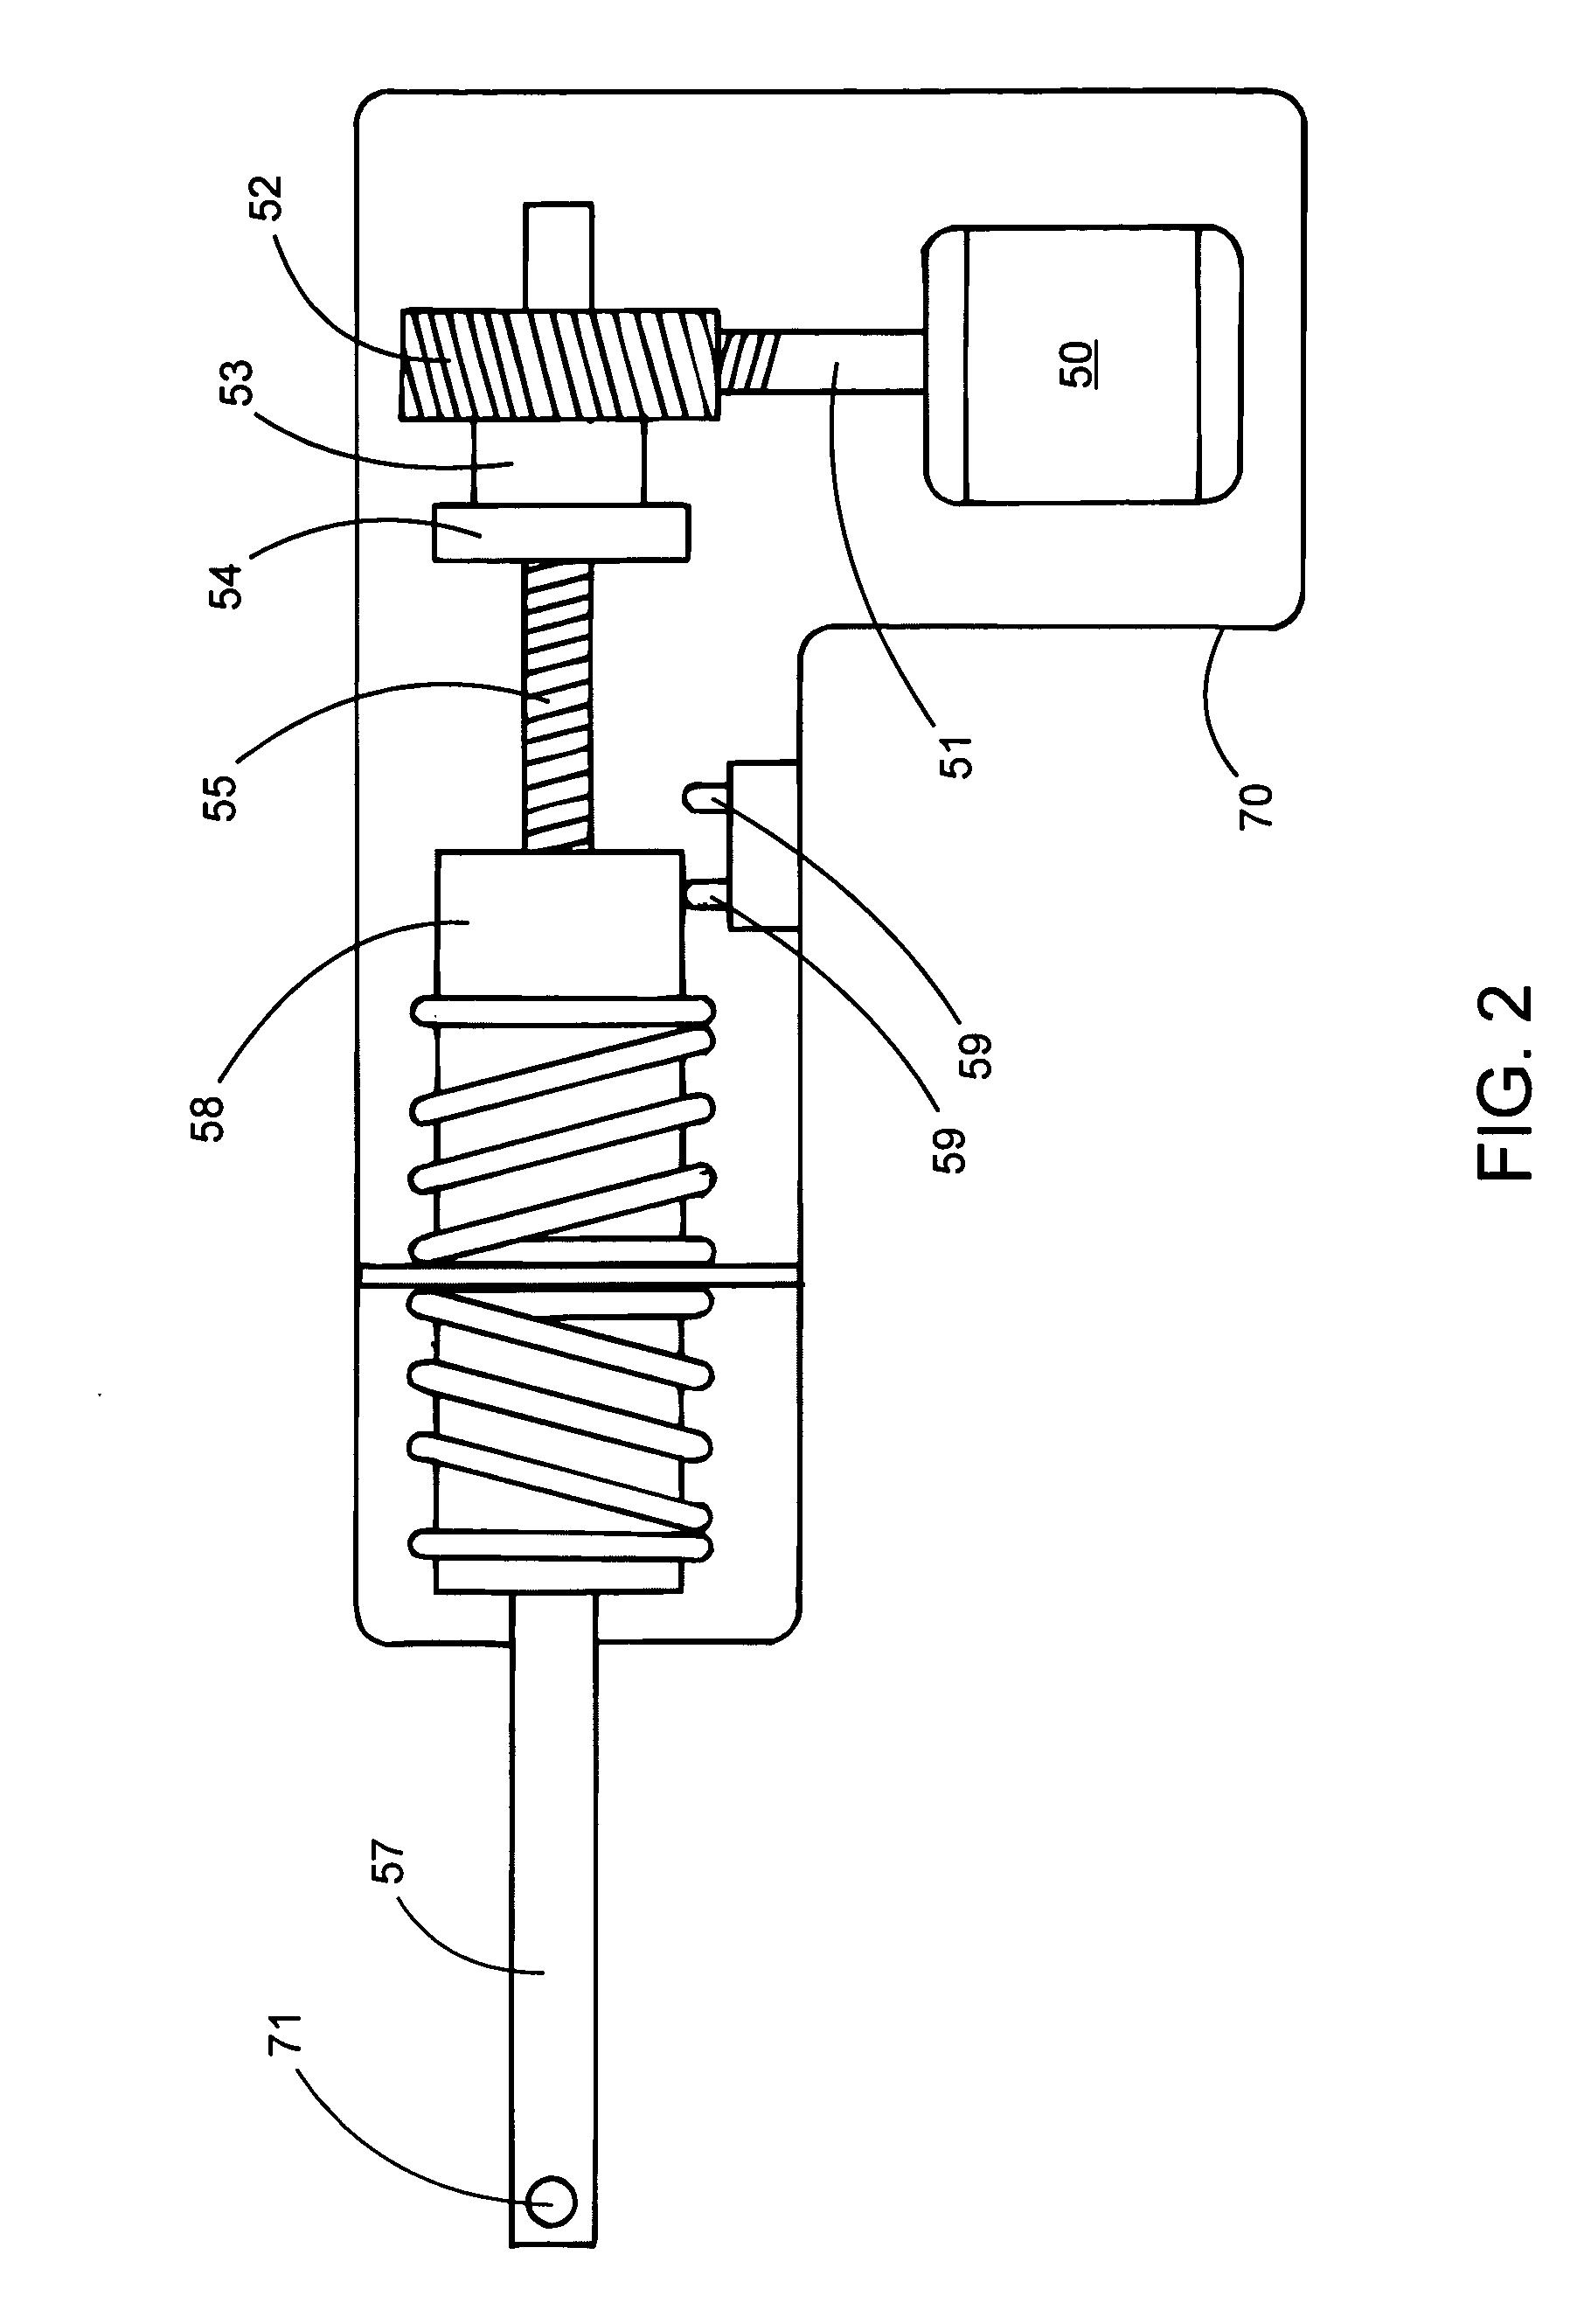 linak actuator wiring diagram   29 wiring diagram images